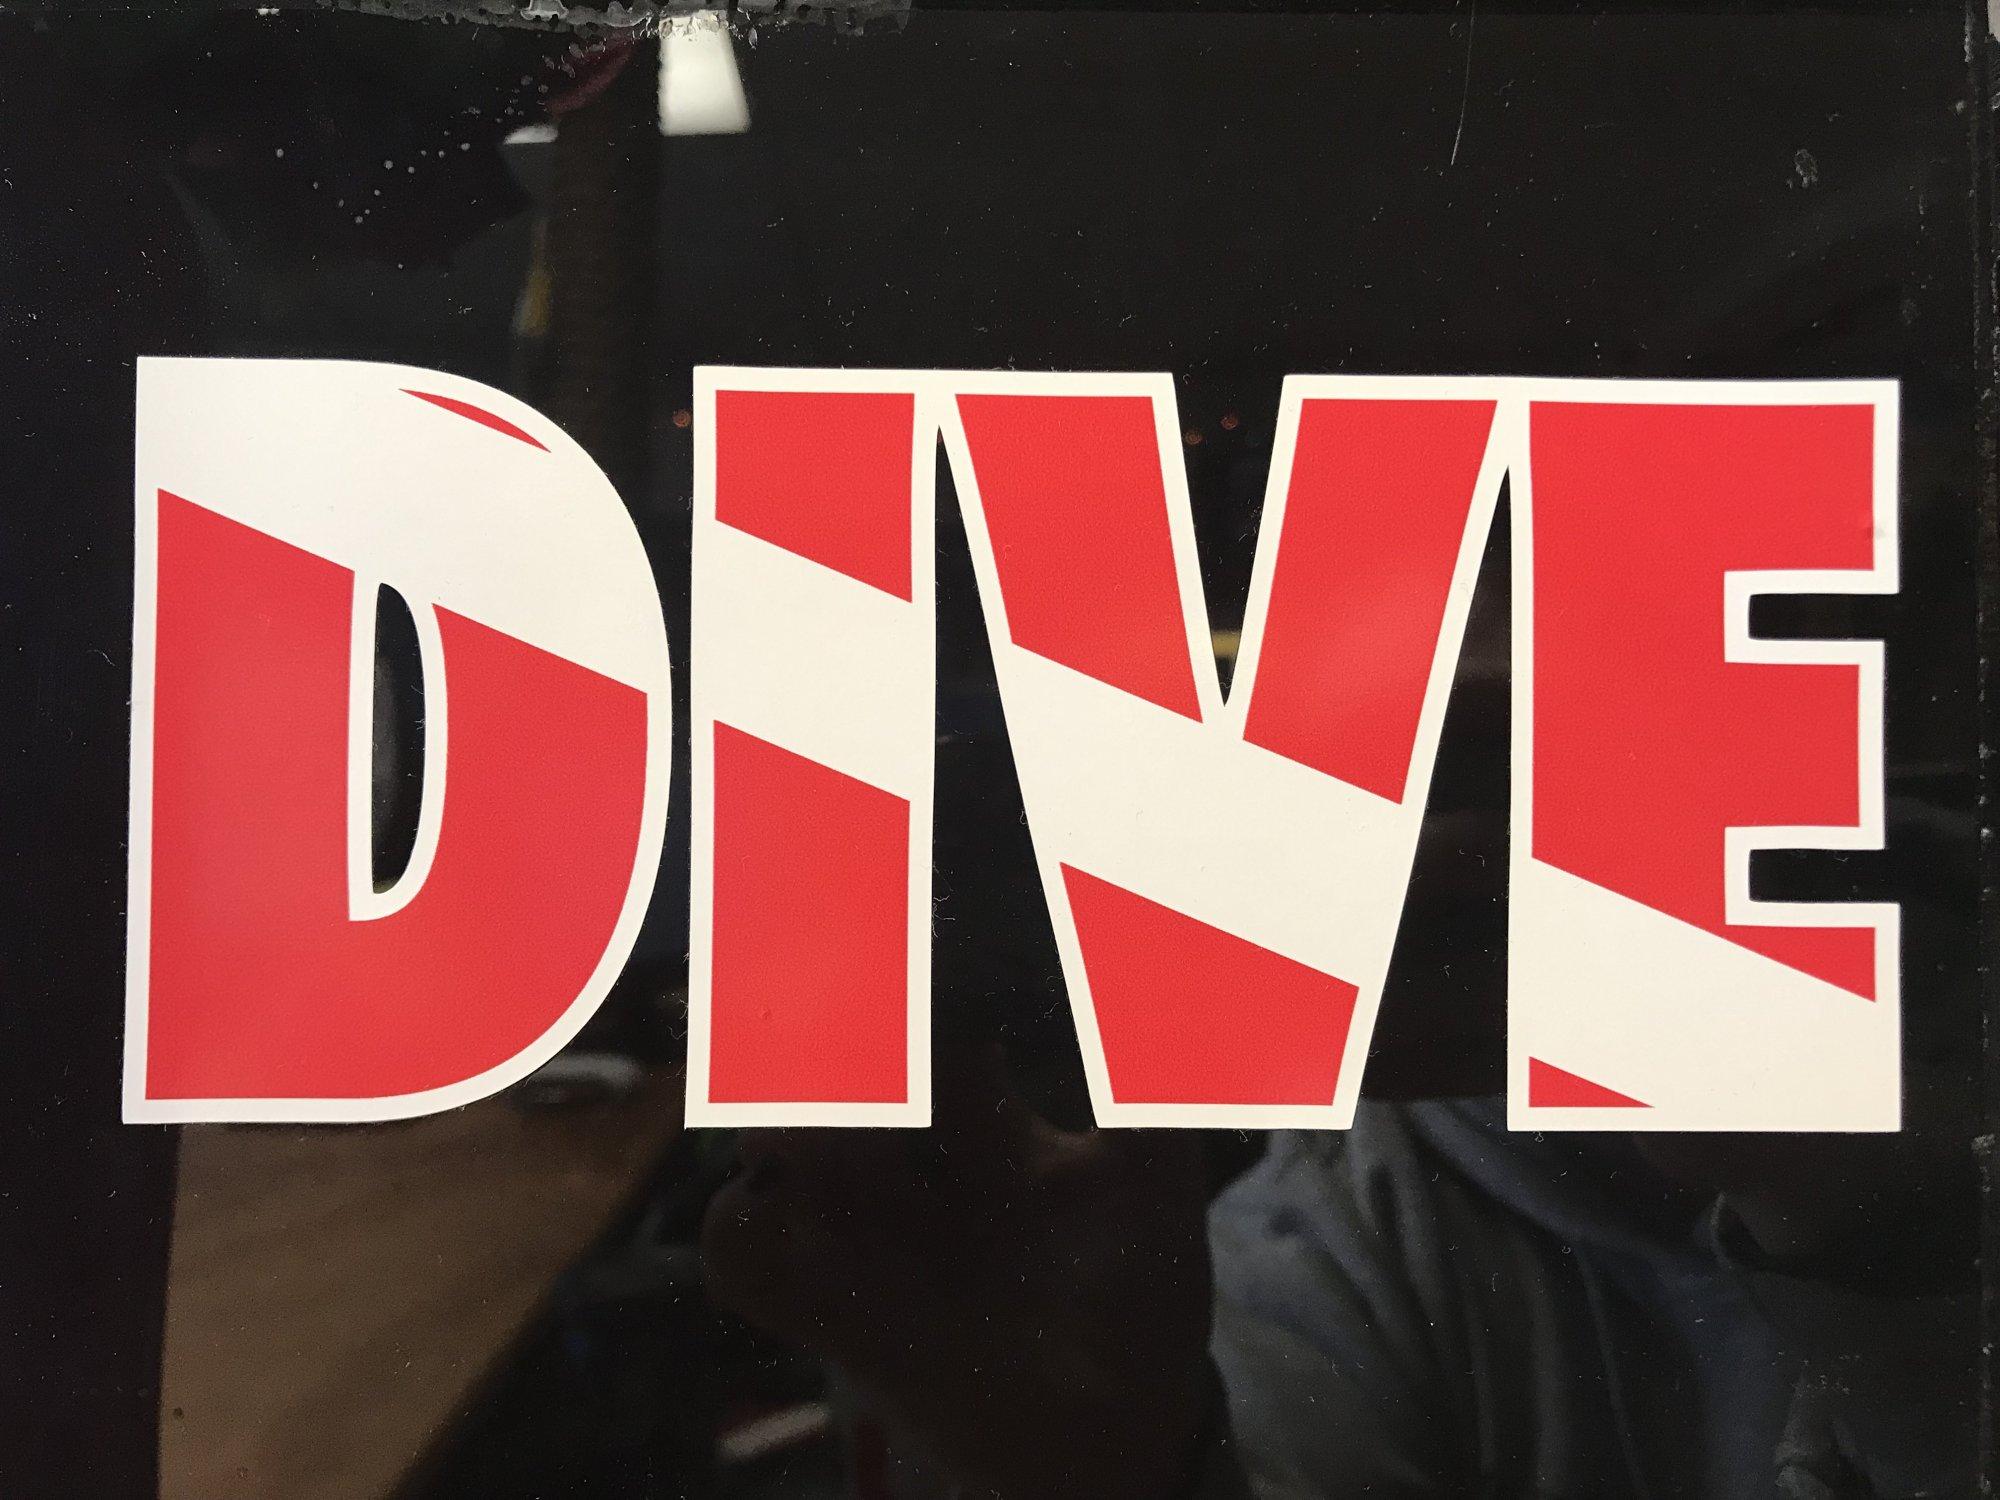 Dive Letters Sticker